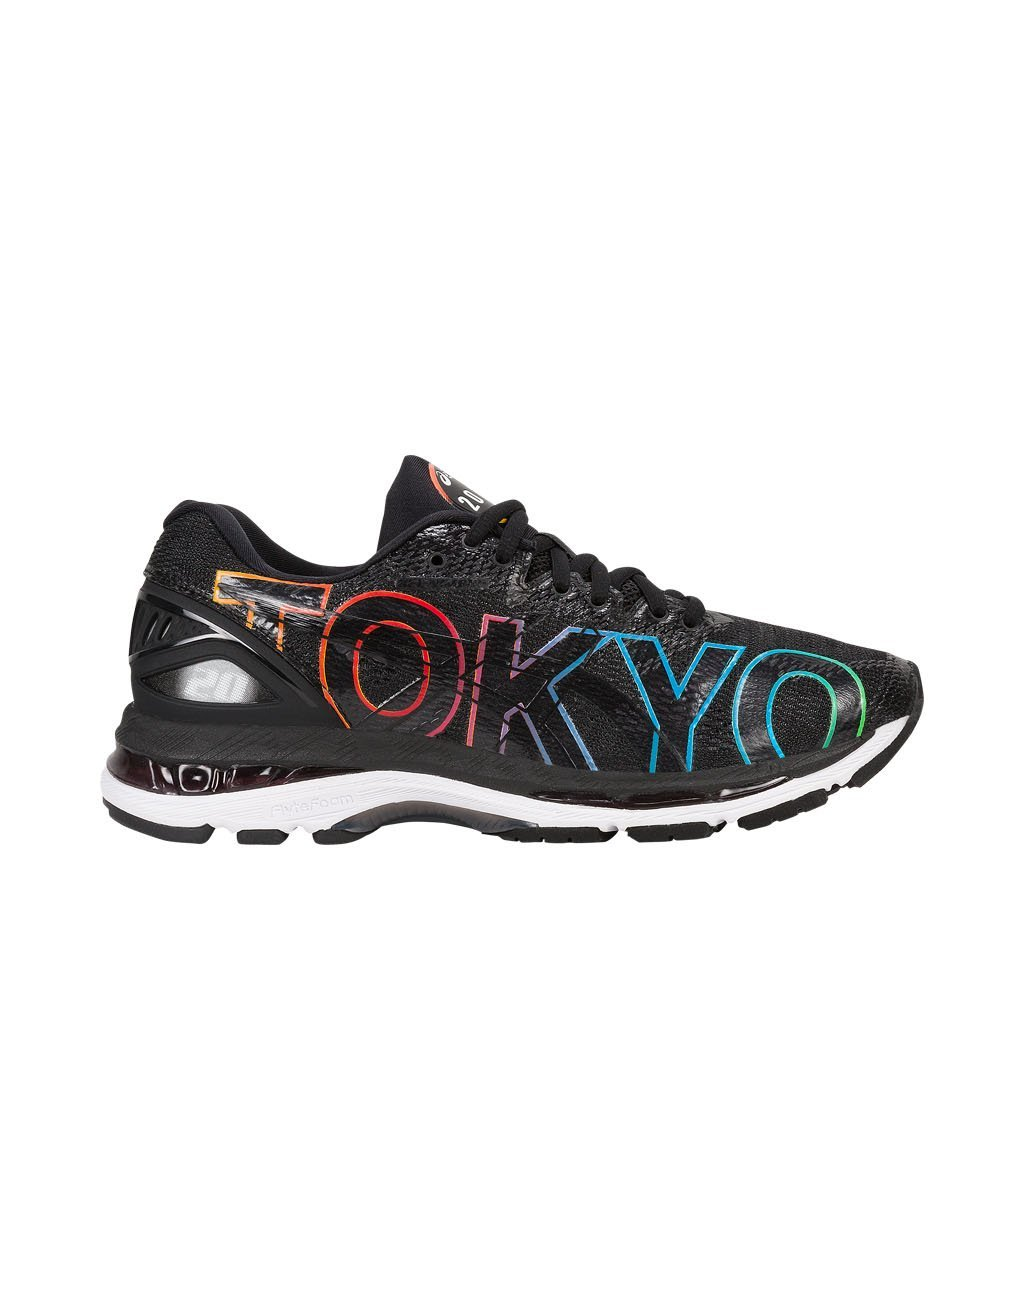 d483cad4b6bbc ASICS Gel-Nimbus 20 Tokyo Marathon - TiendaMIA.com